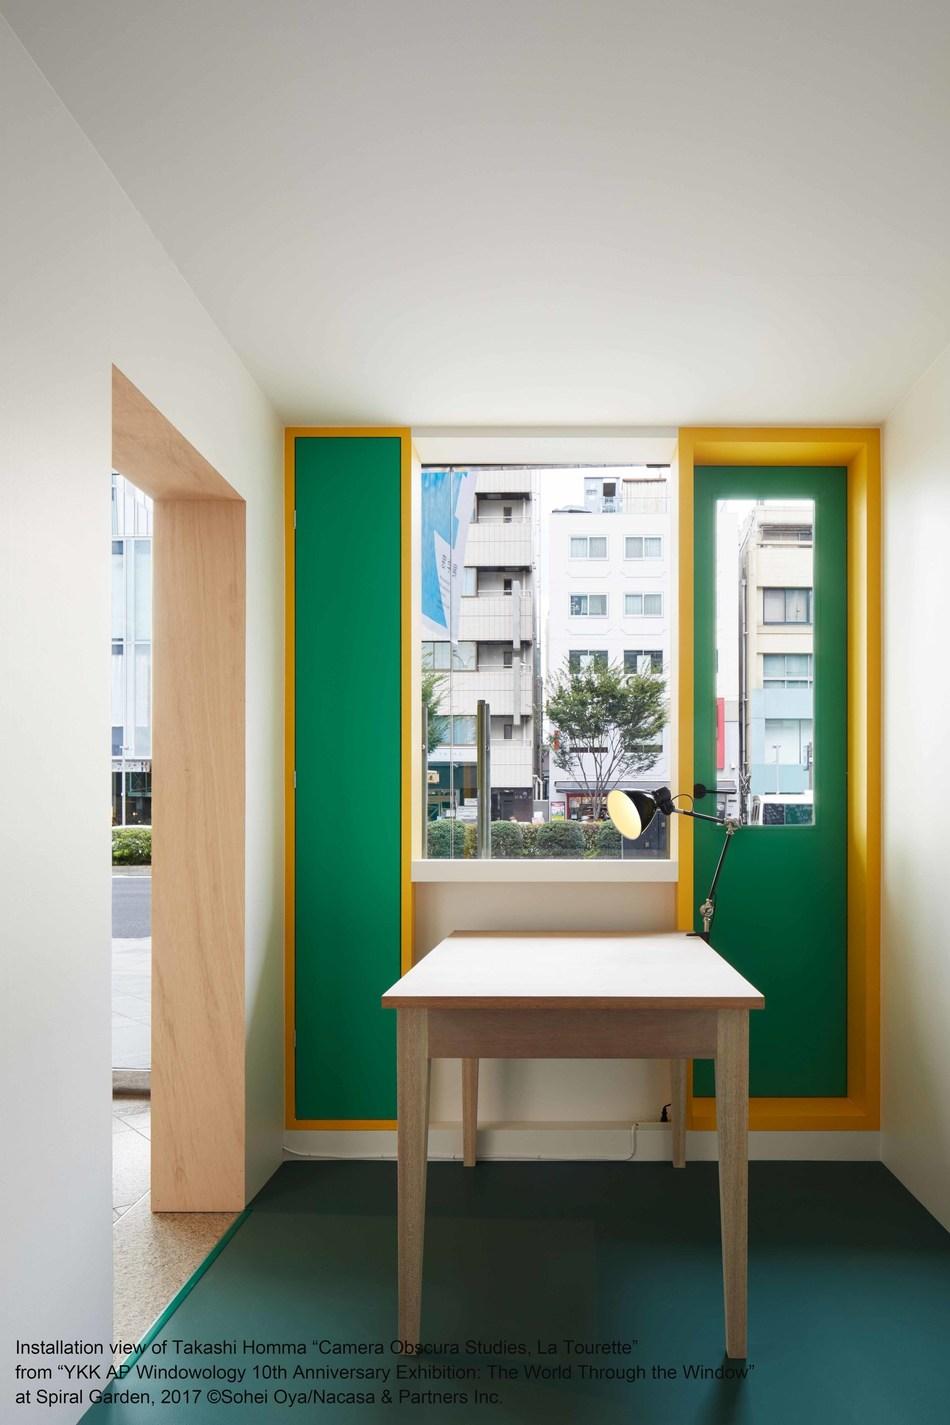 "Installation view of Takashi Homma ""Camera Obscura Studies, La Tourette"" from ""YKK AP Windowology 10th Anniversary Exhibition: The World Through the Window"" at Spiral Garden, 2017"